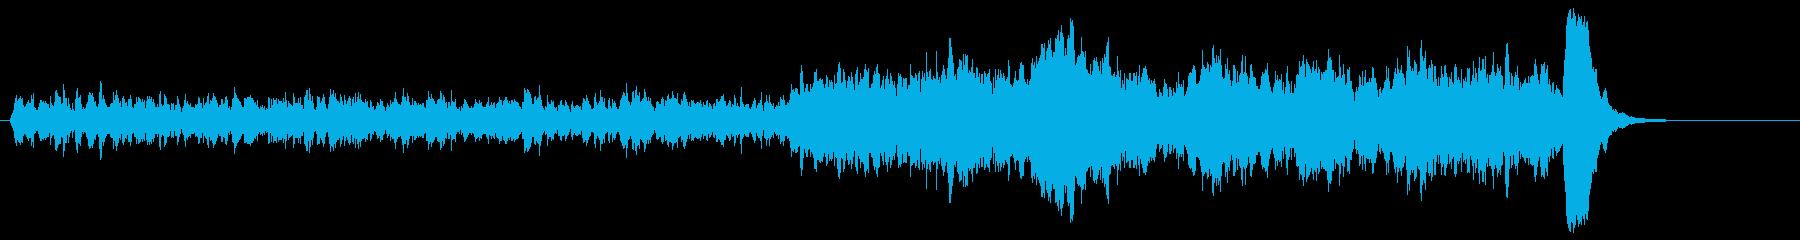 d悲劇的で緊迫したストリングス 30秒の再生済みの波形